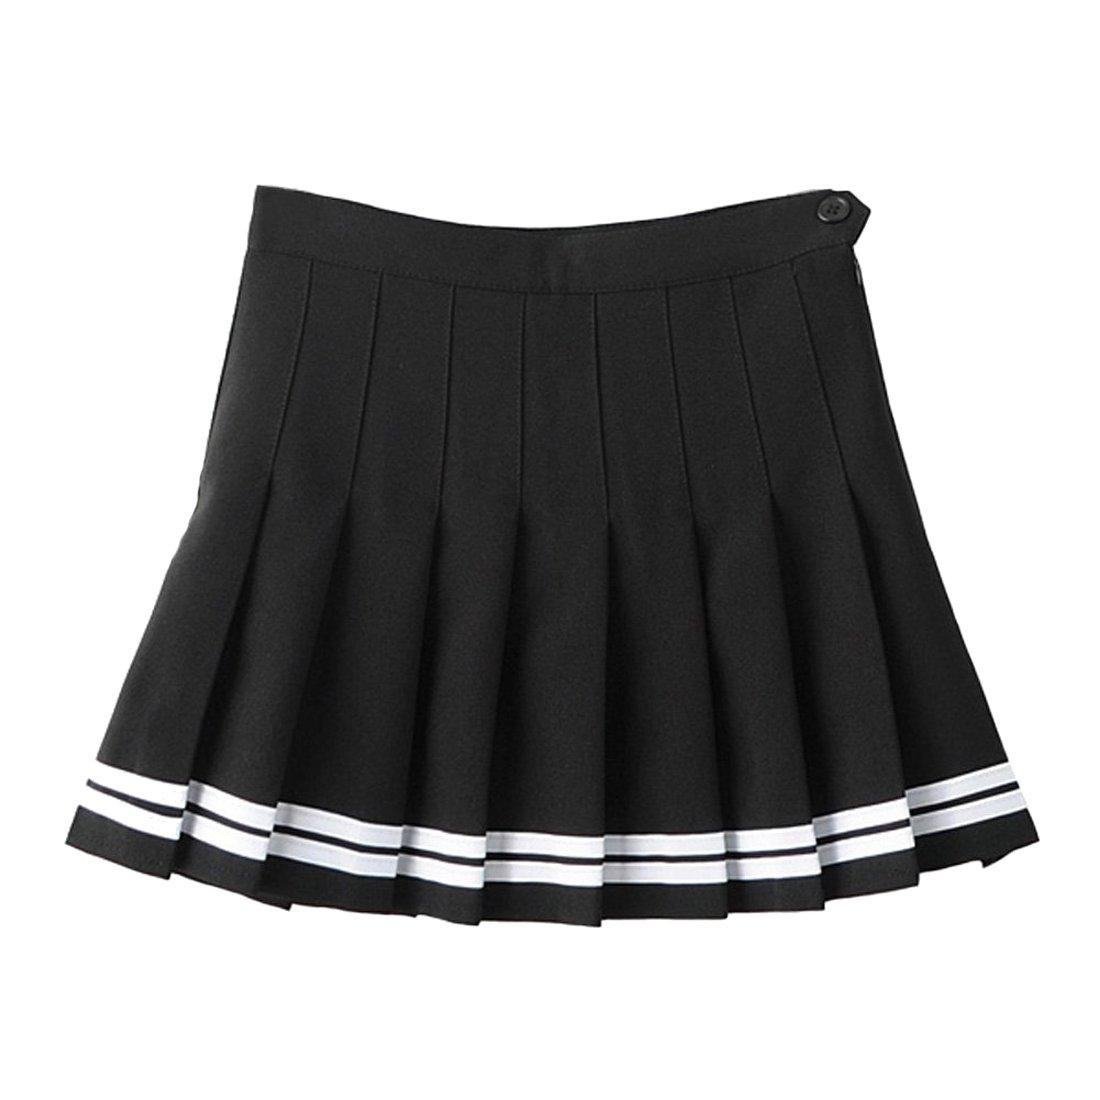 TZSJGL Girls Sports High Waist Pleated Skirts Underpants Cheerleader Teen Tennis Scooters Skirts